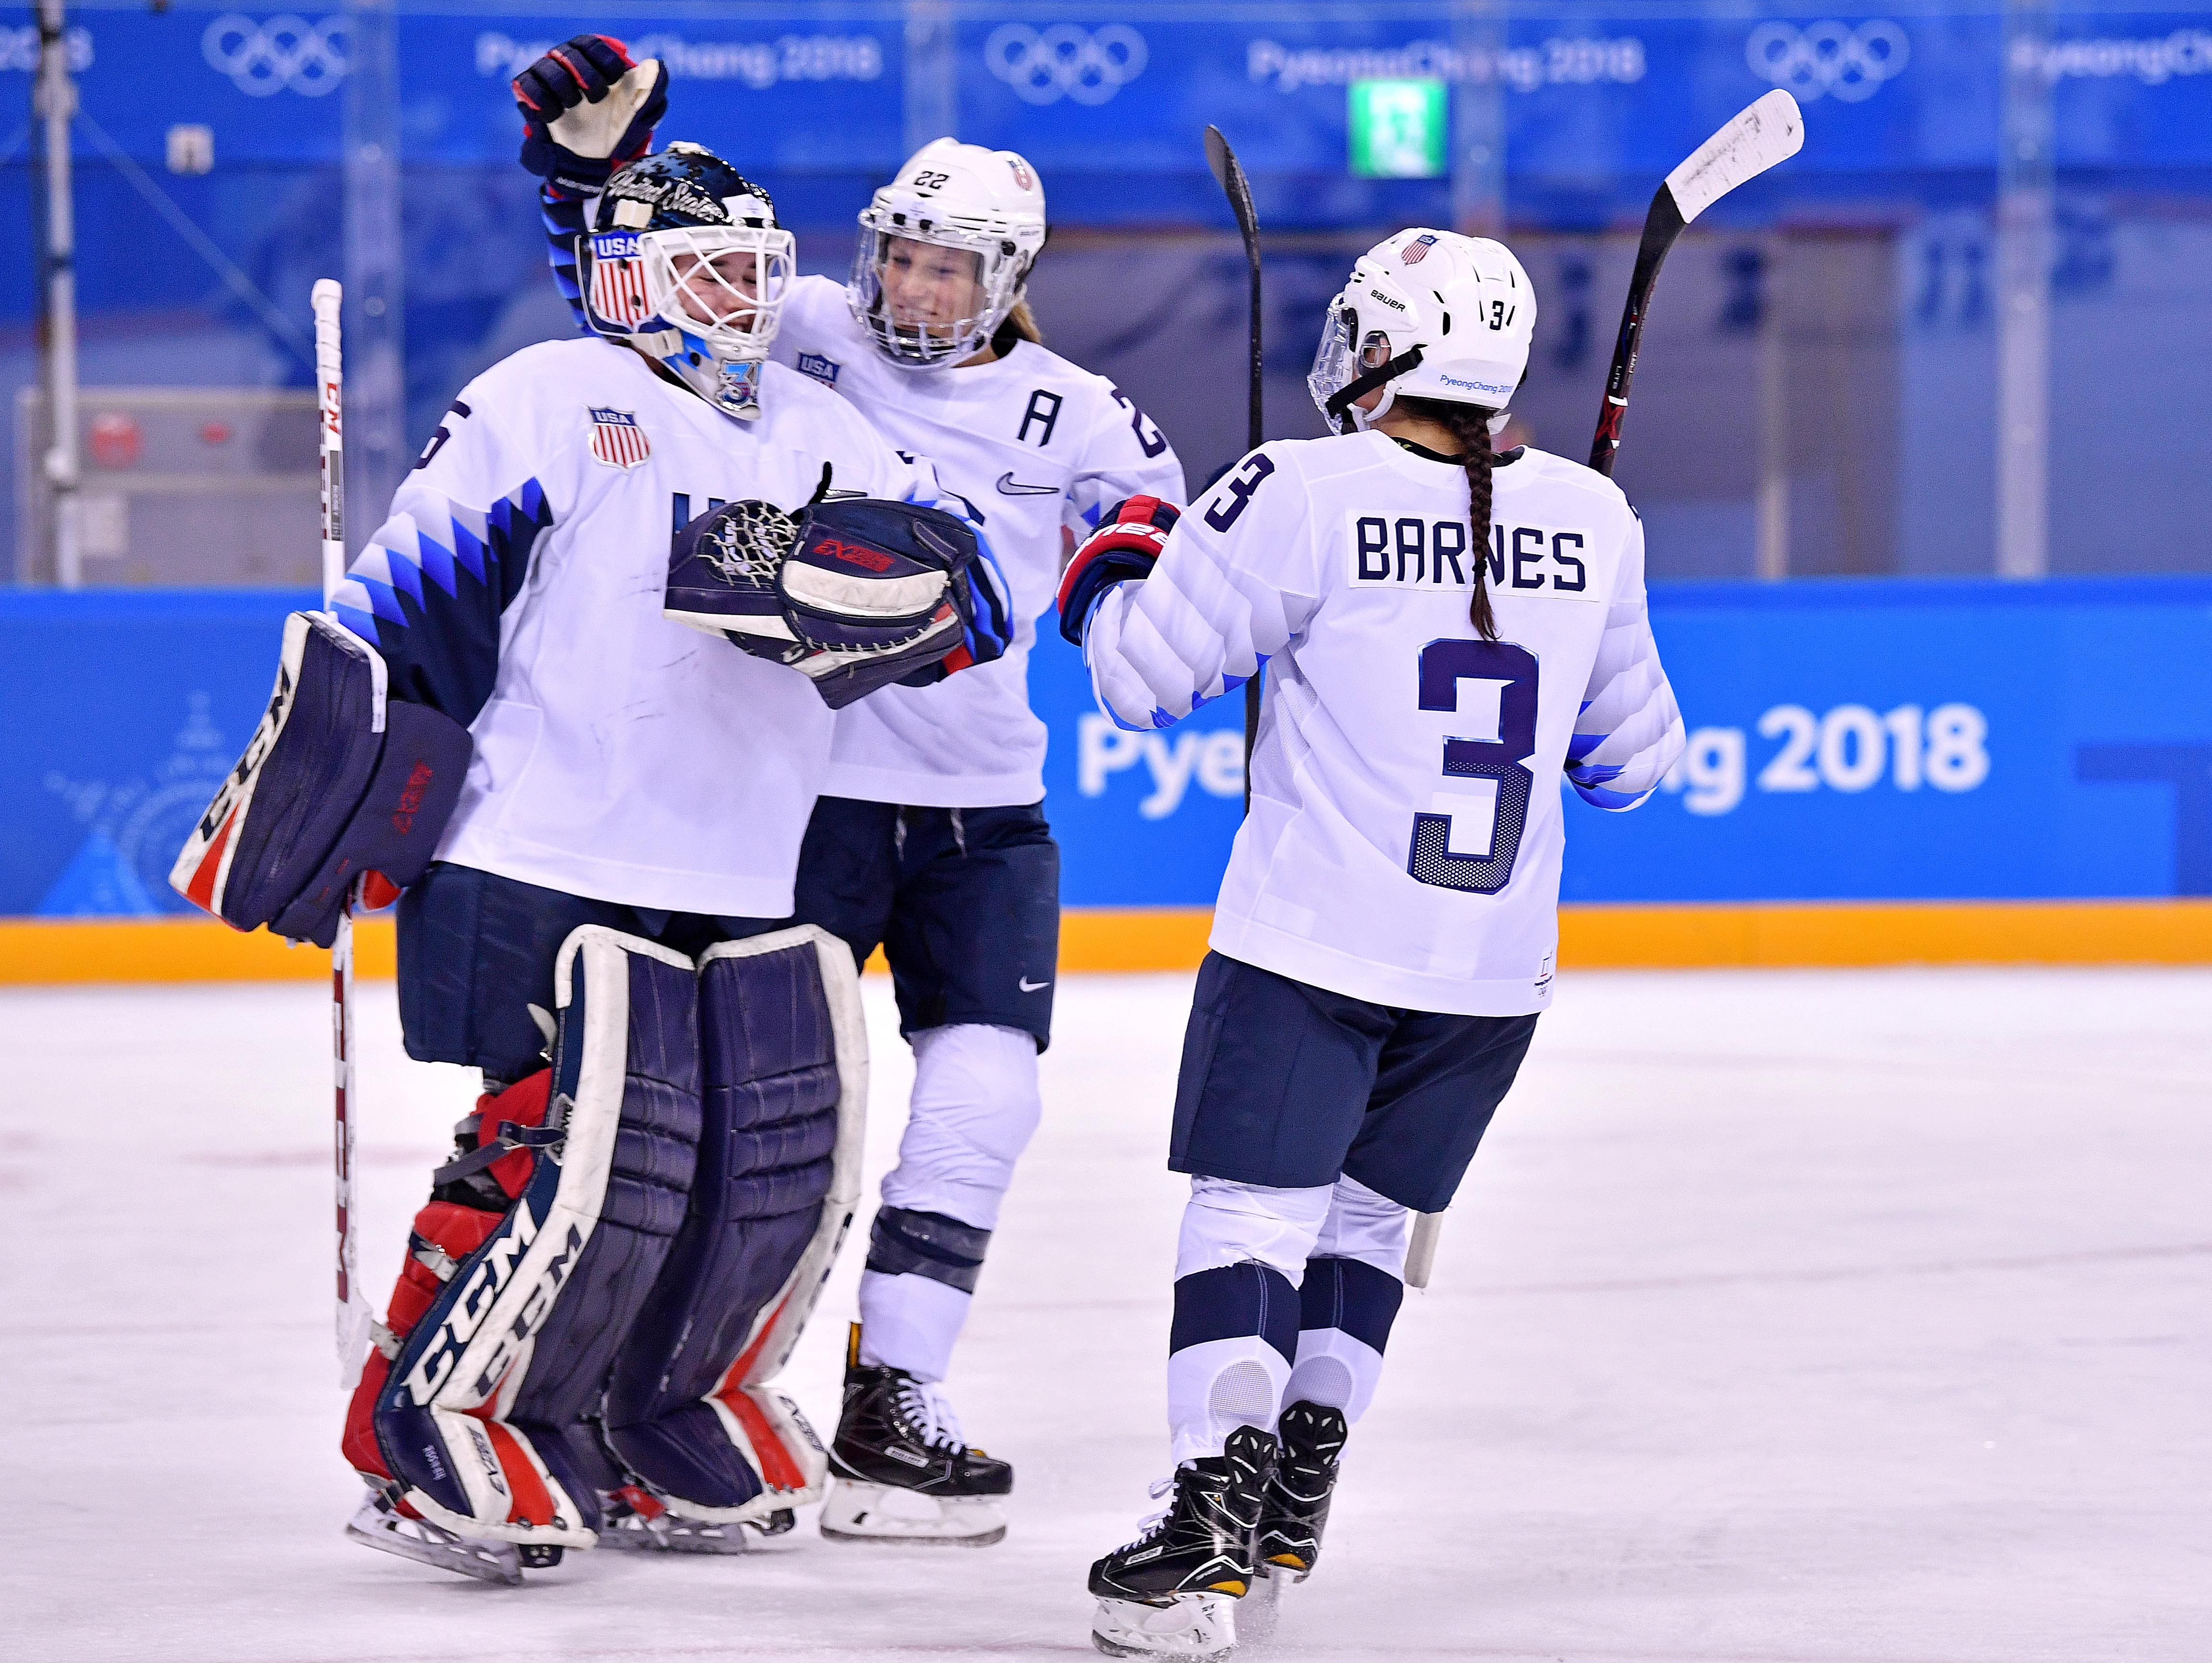 U.S. women's hockey team opens with 3-1 win vs. Finland, but it wasn't easy